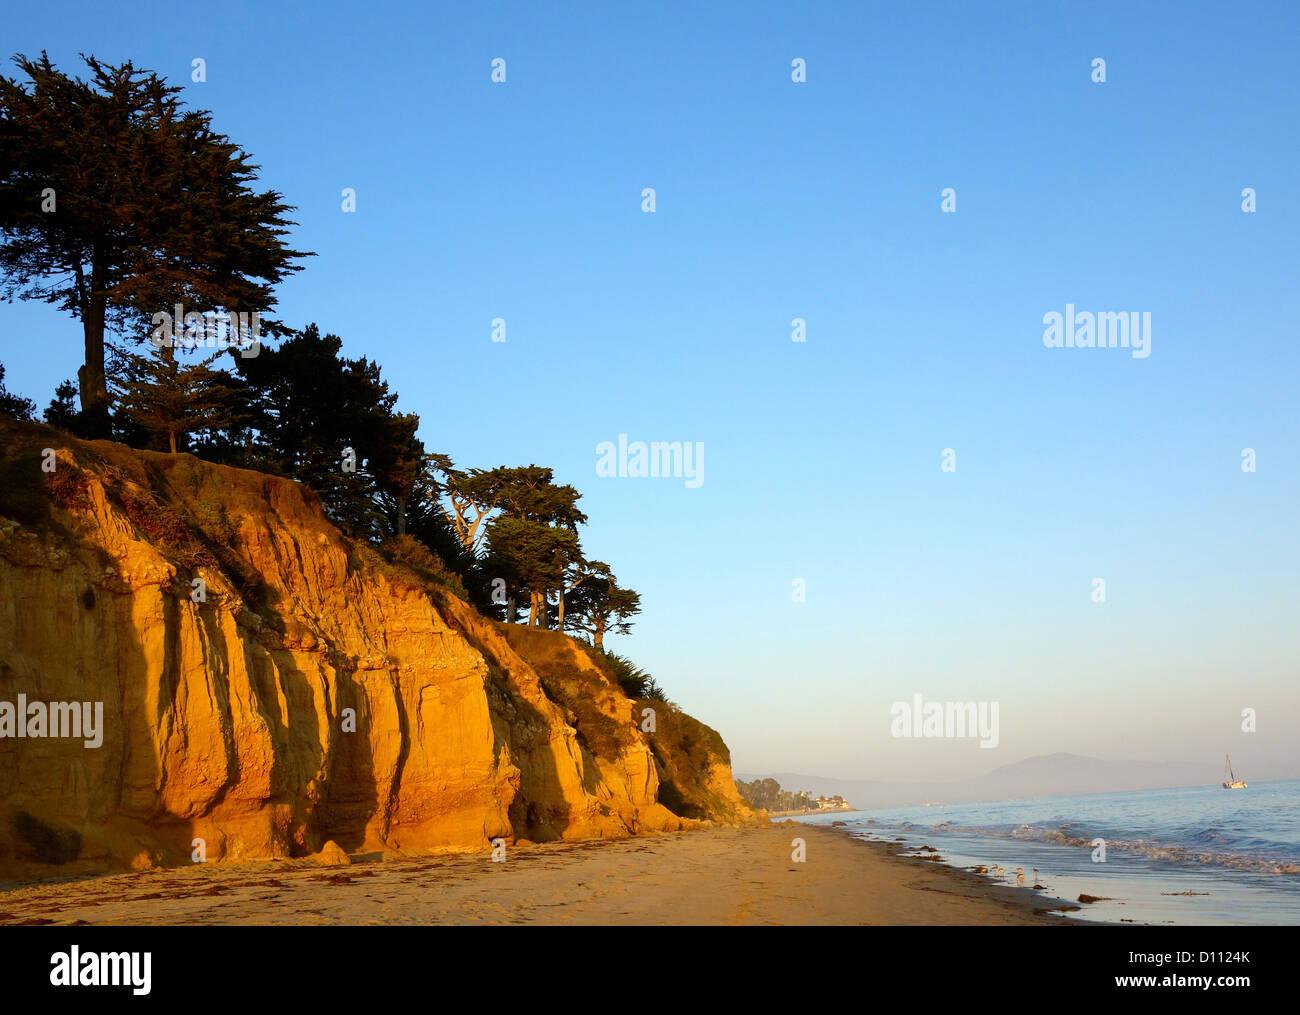 butterfly-beach-montecito-santa-barbara-